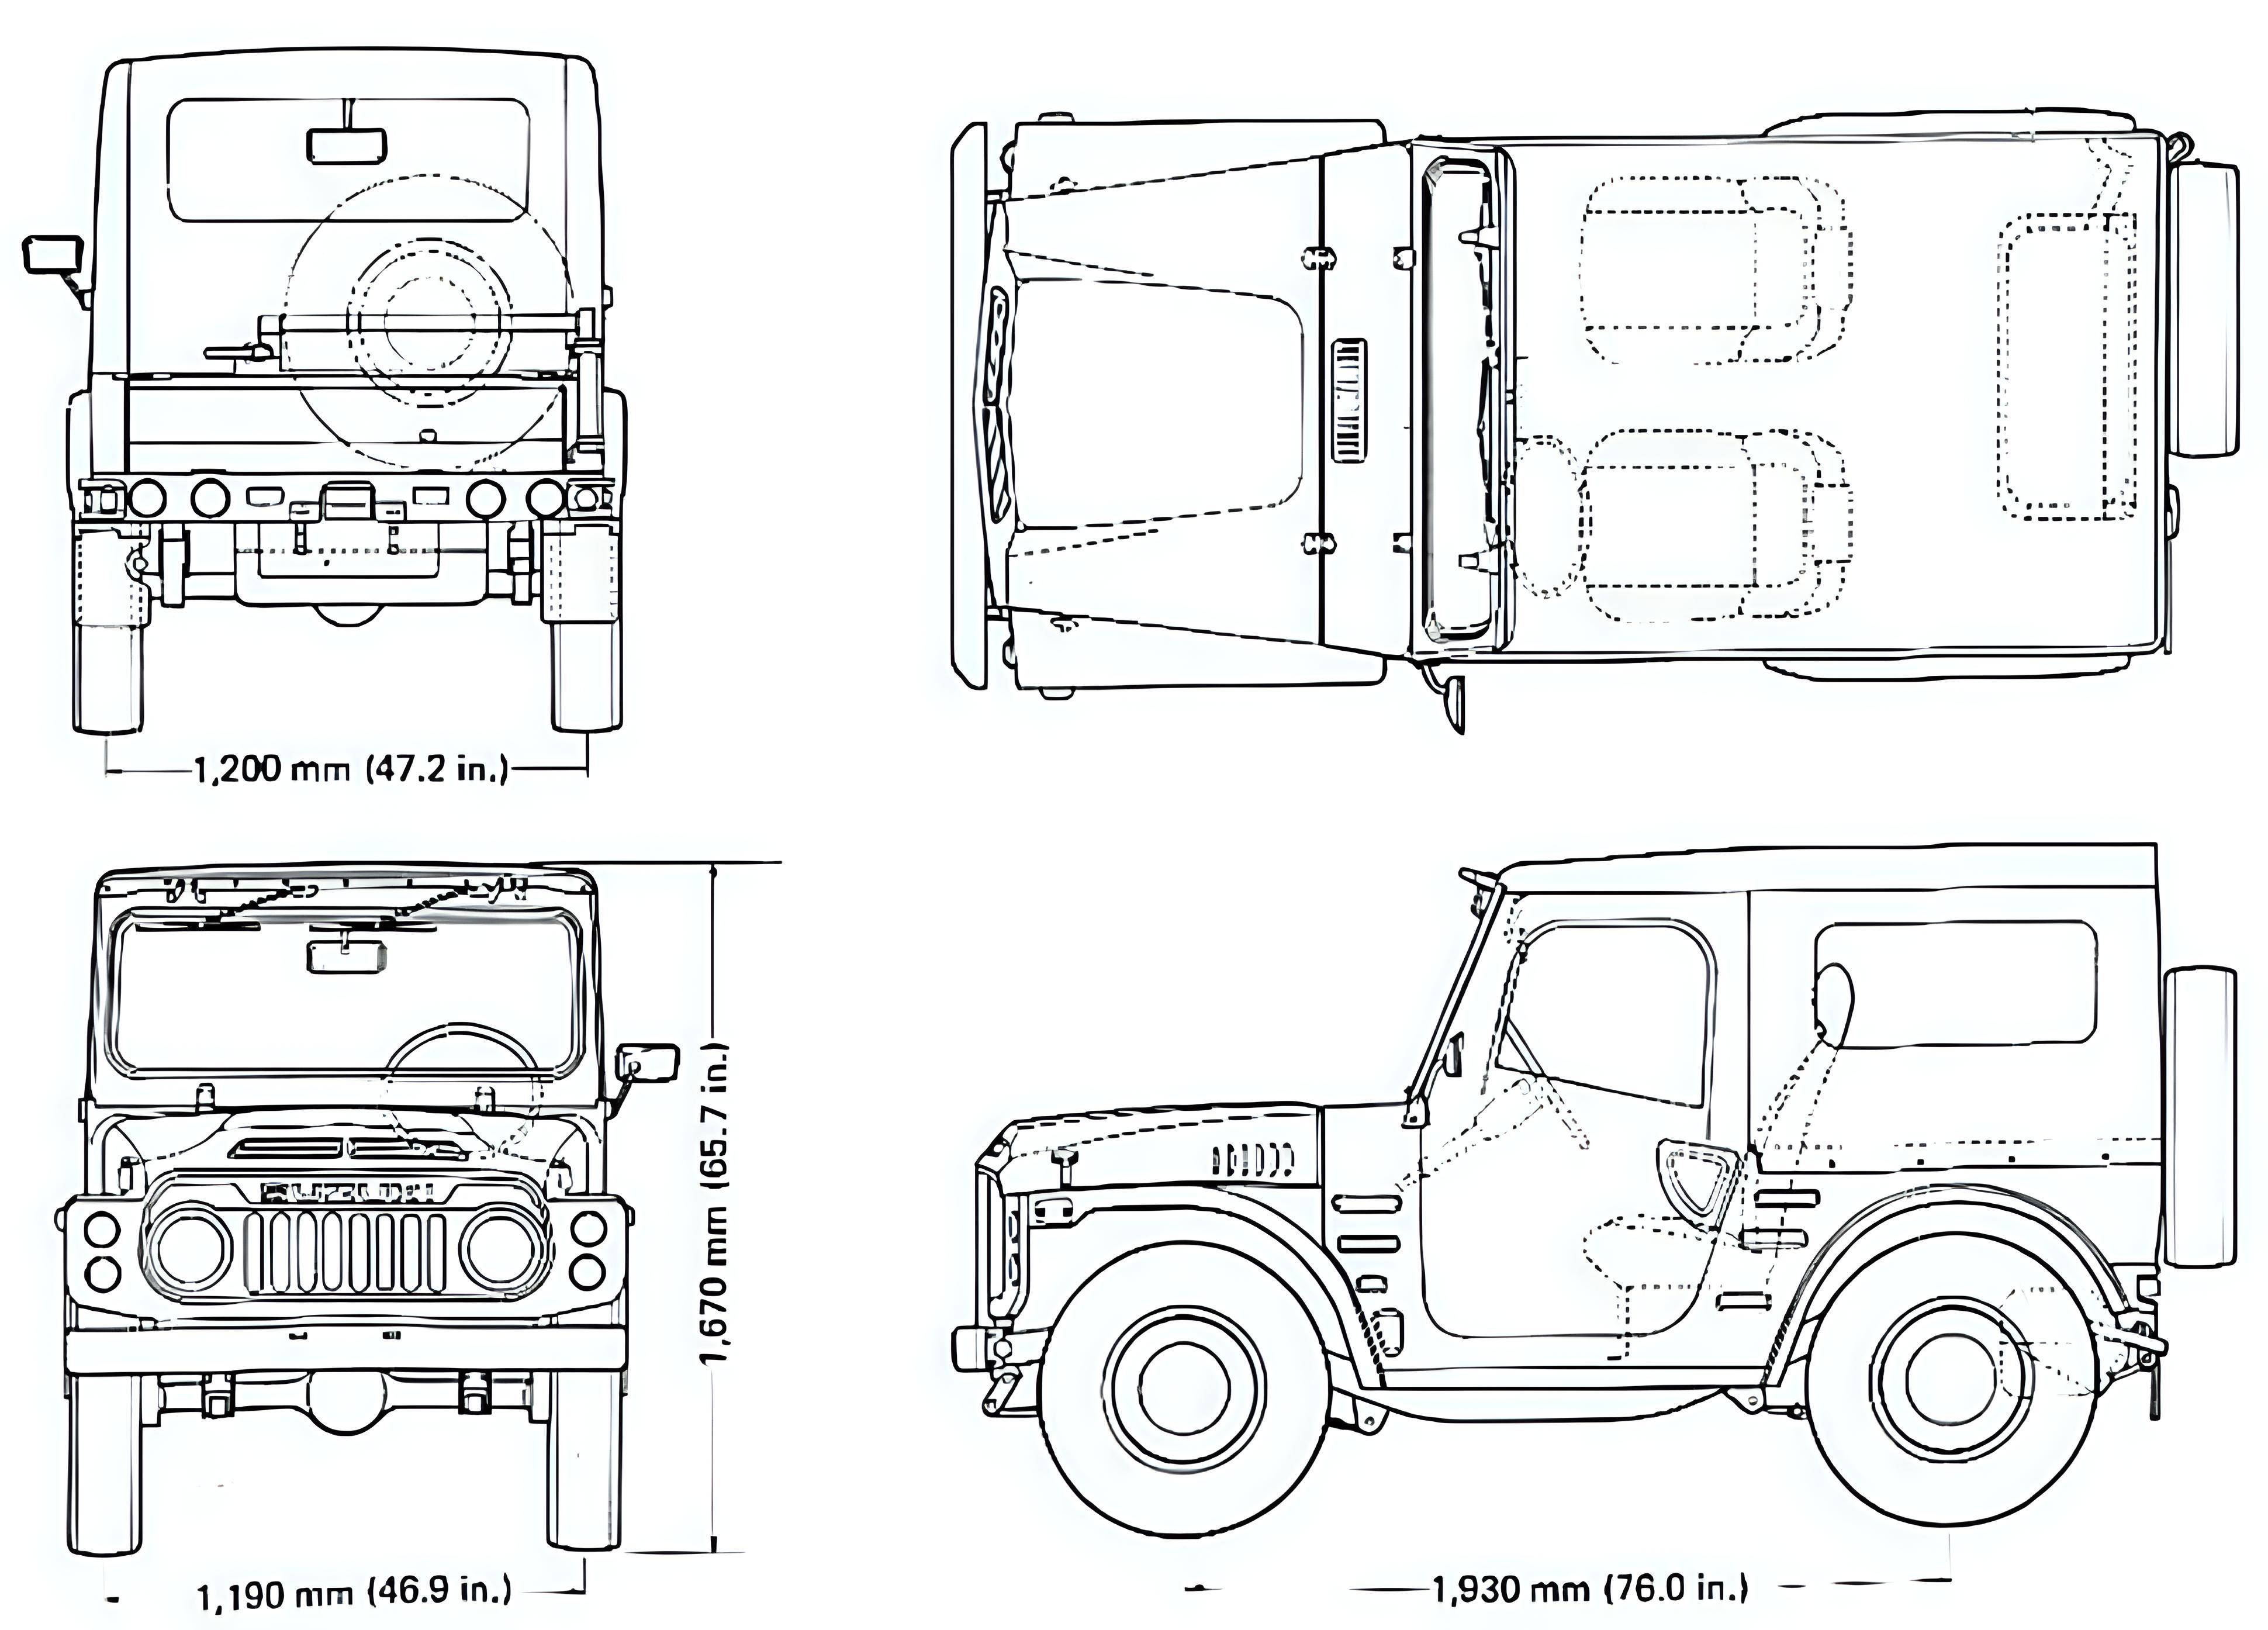 Suzuki LJ 80 technical details, history, photos on Better